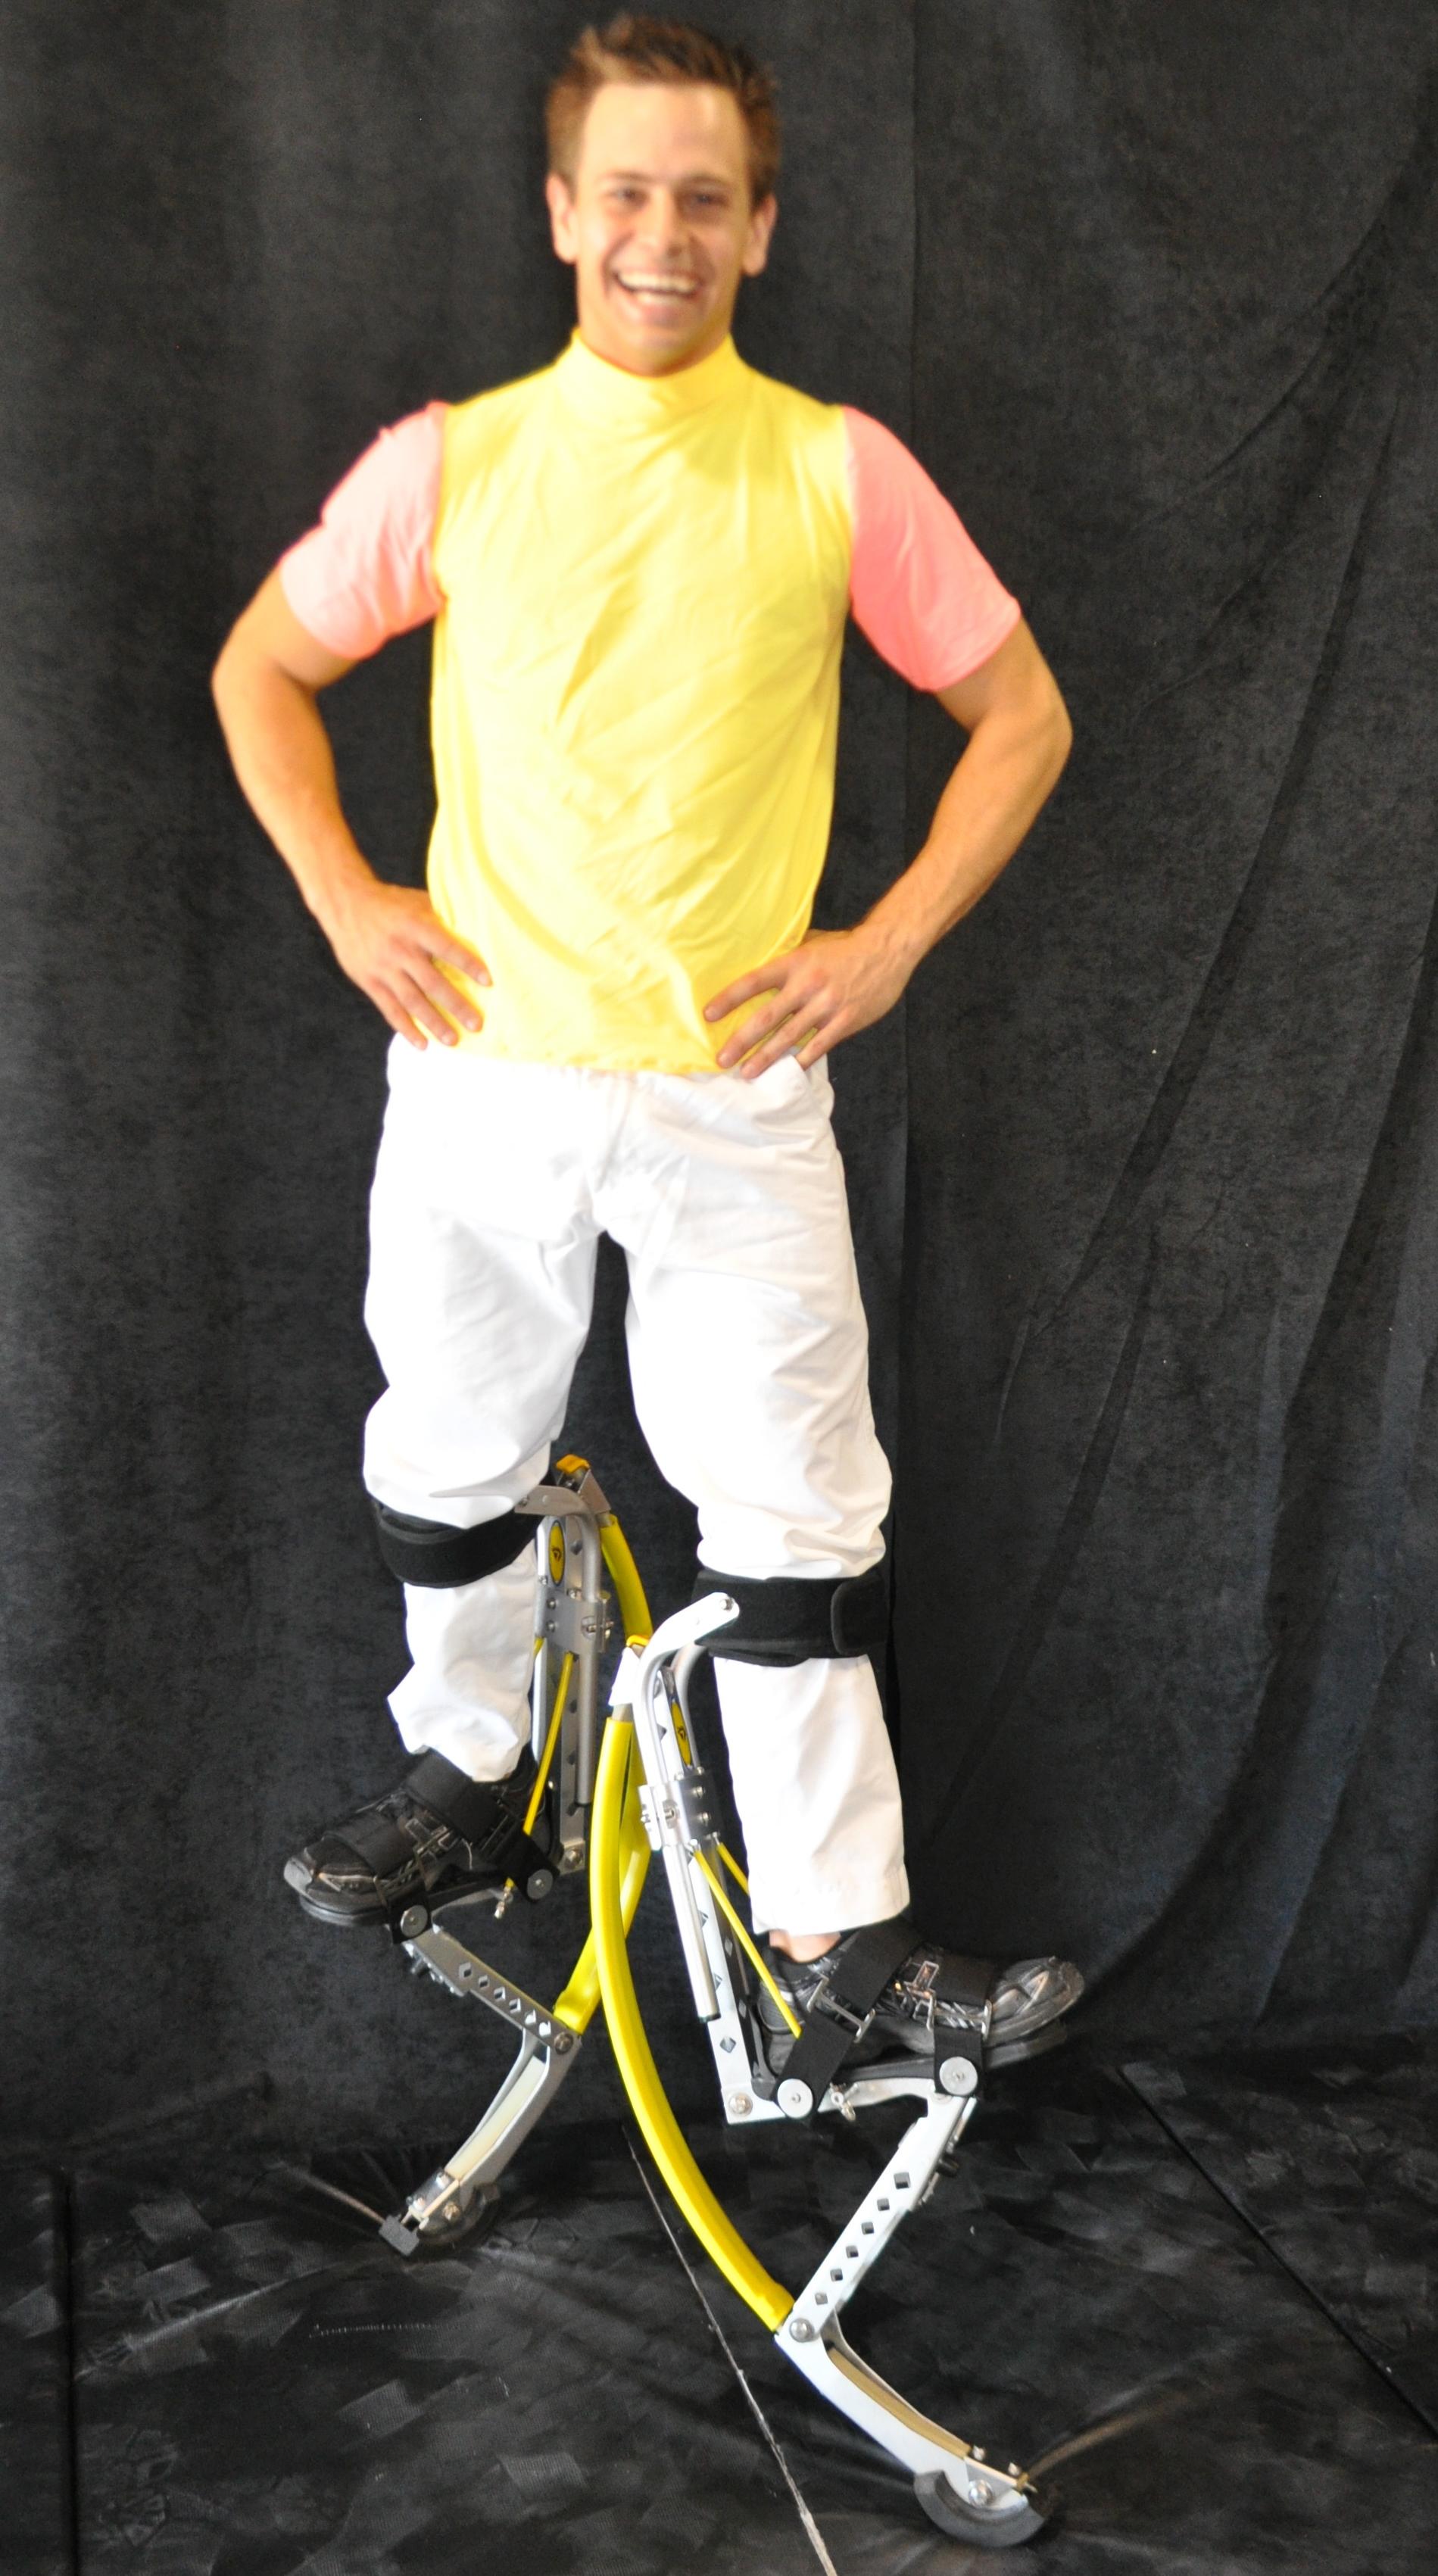 Yellow top costume